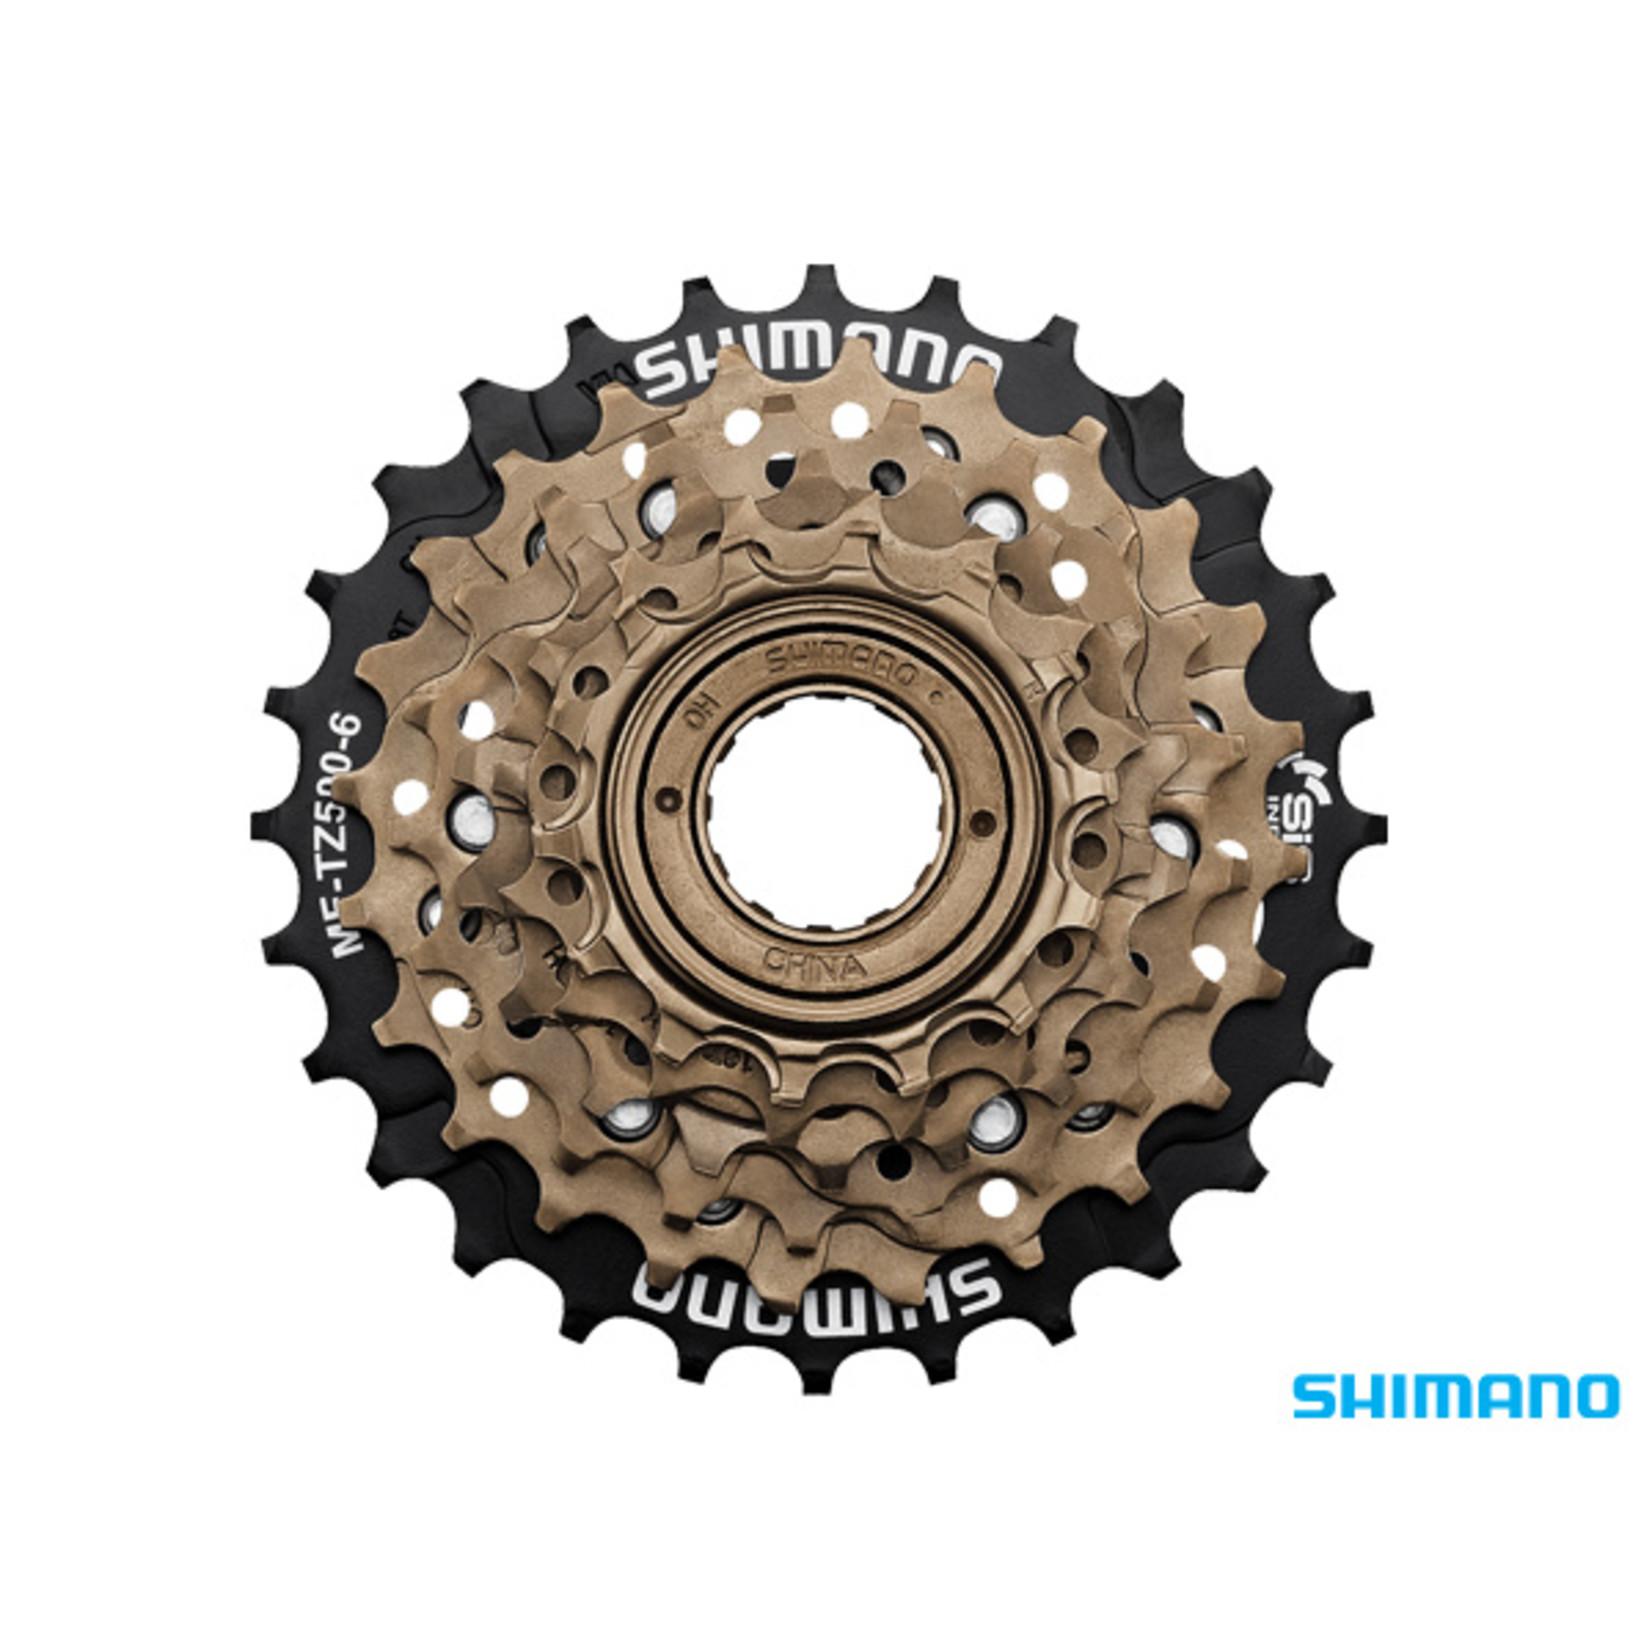 Shimano Shimano, MF-TZ500 Freewheel 6 Speed 14-28